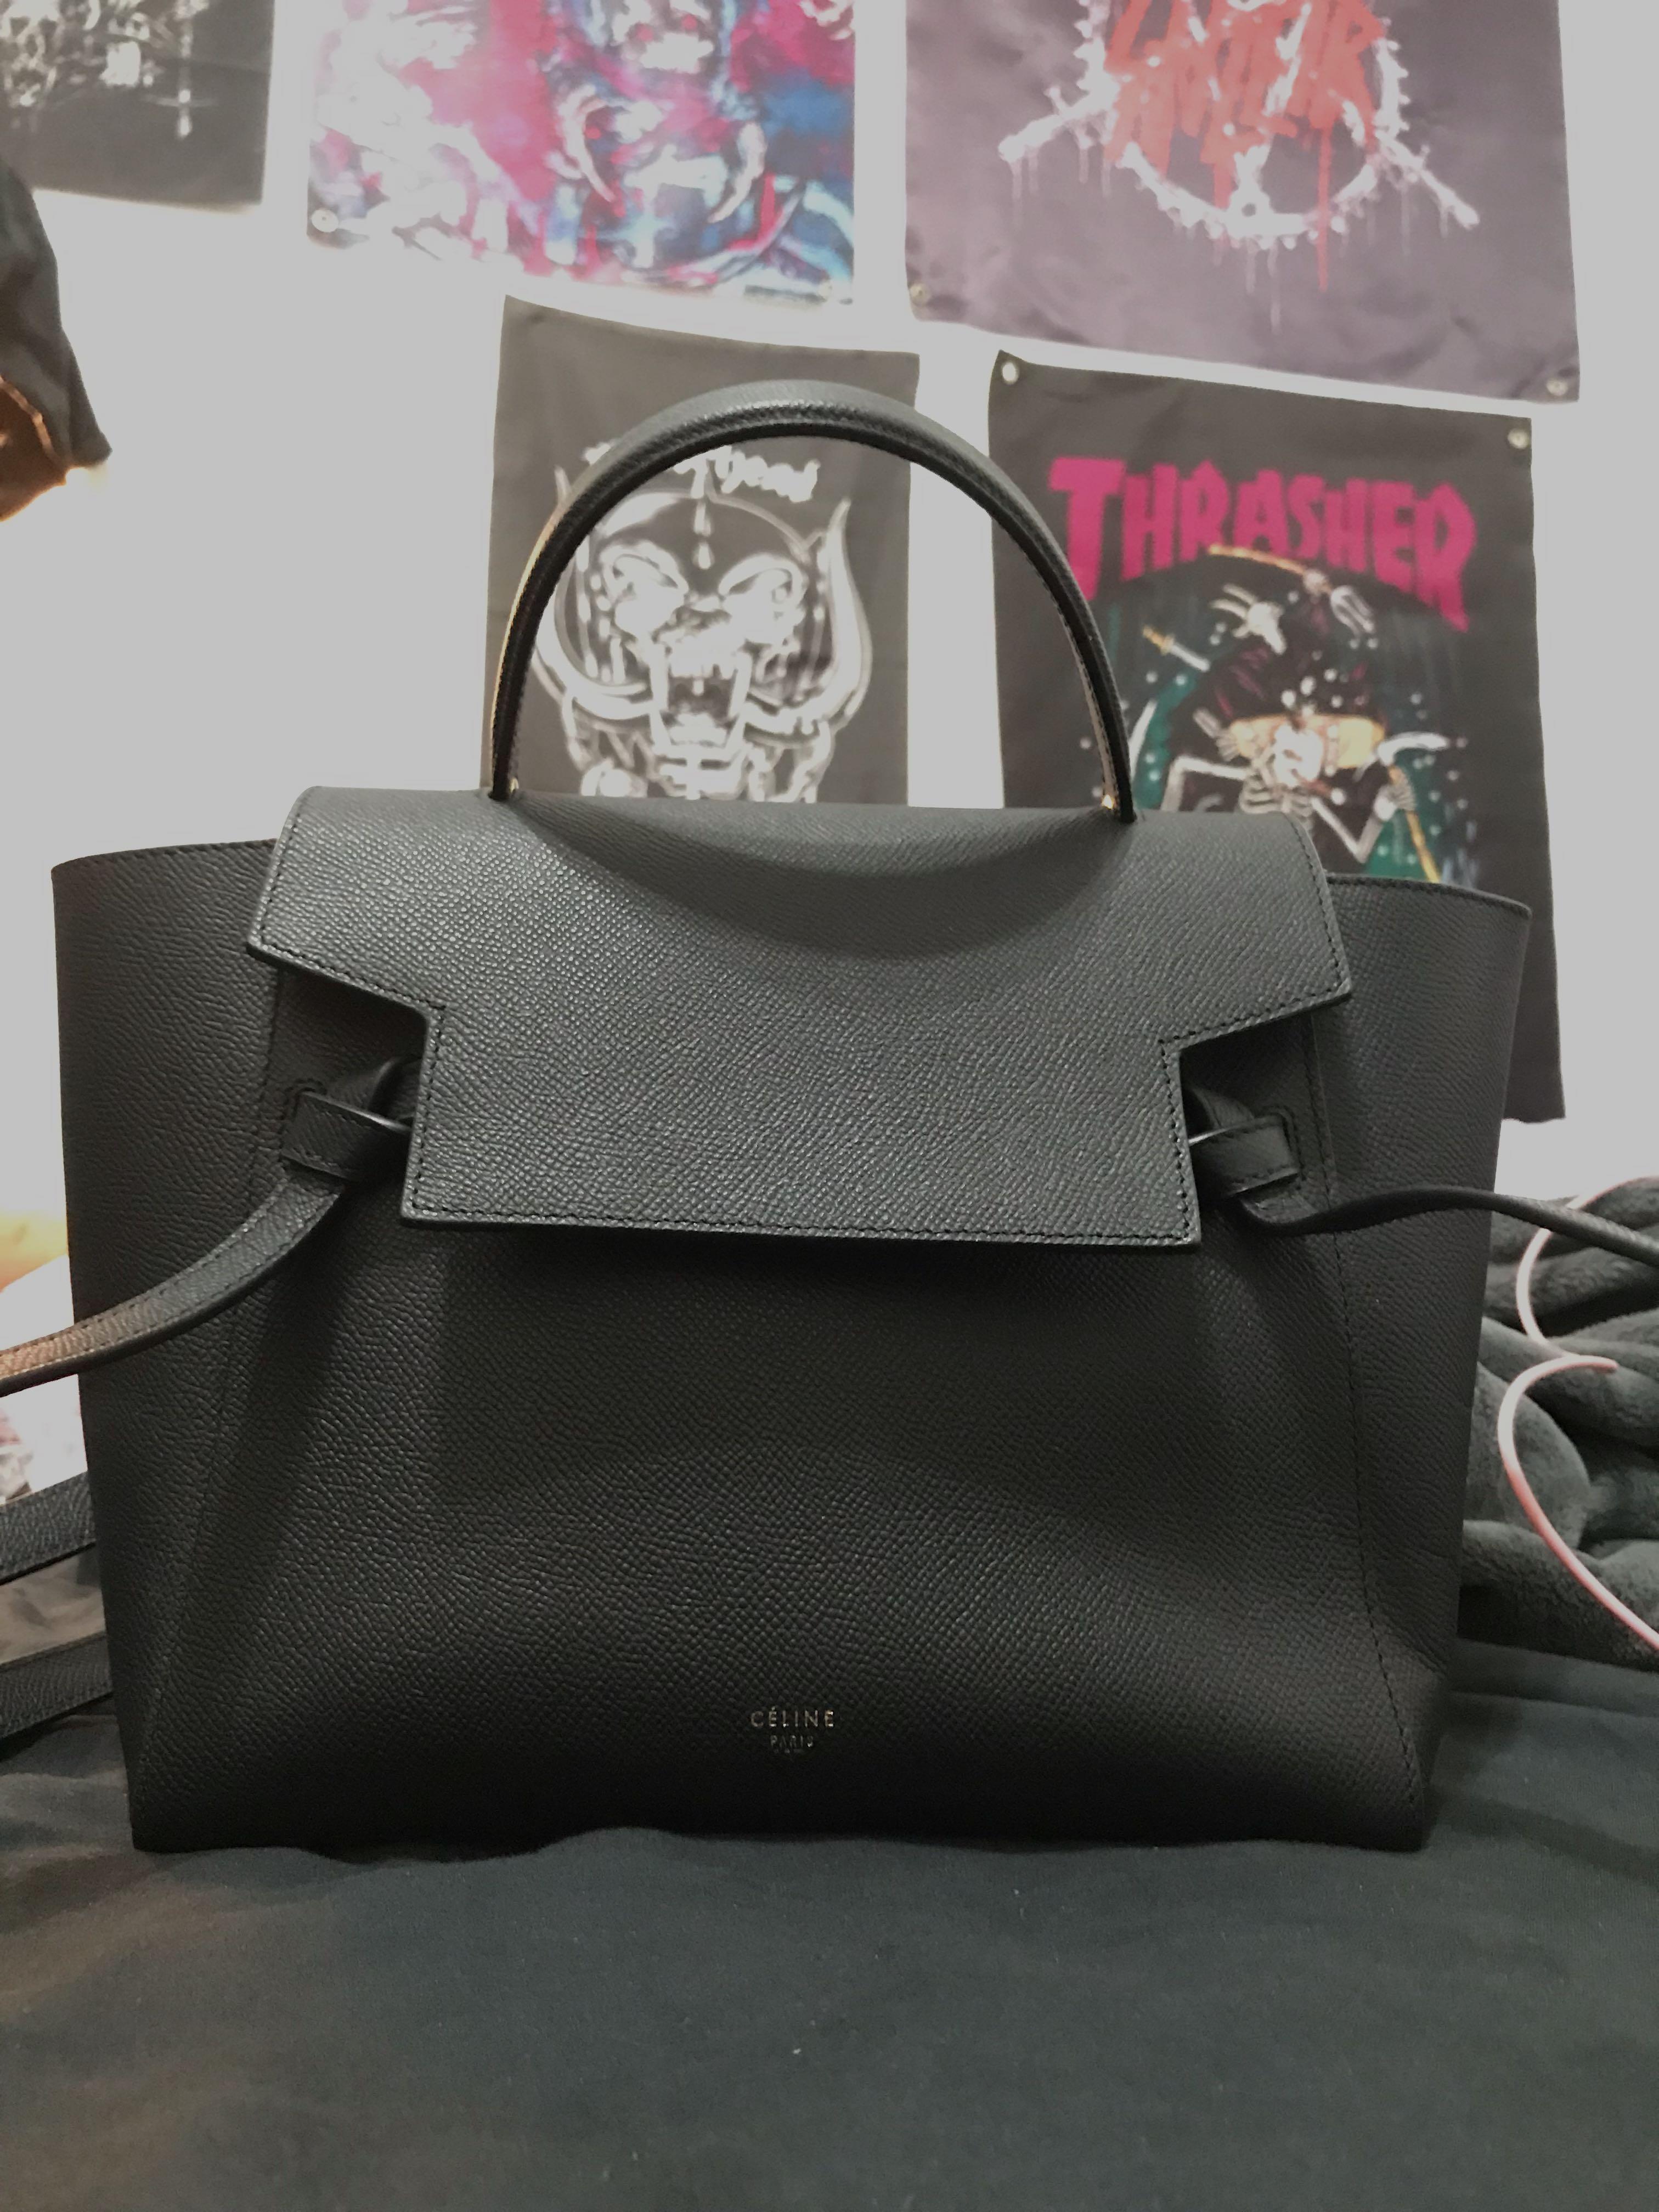 Celine Micro Belt Bag Luxury Bags Wallets Handbags On Carousell